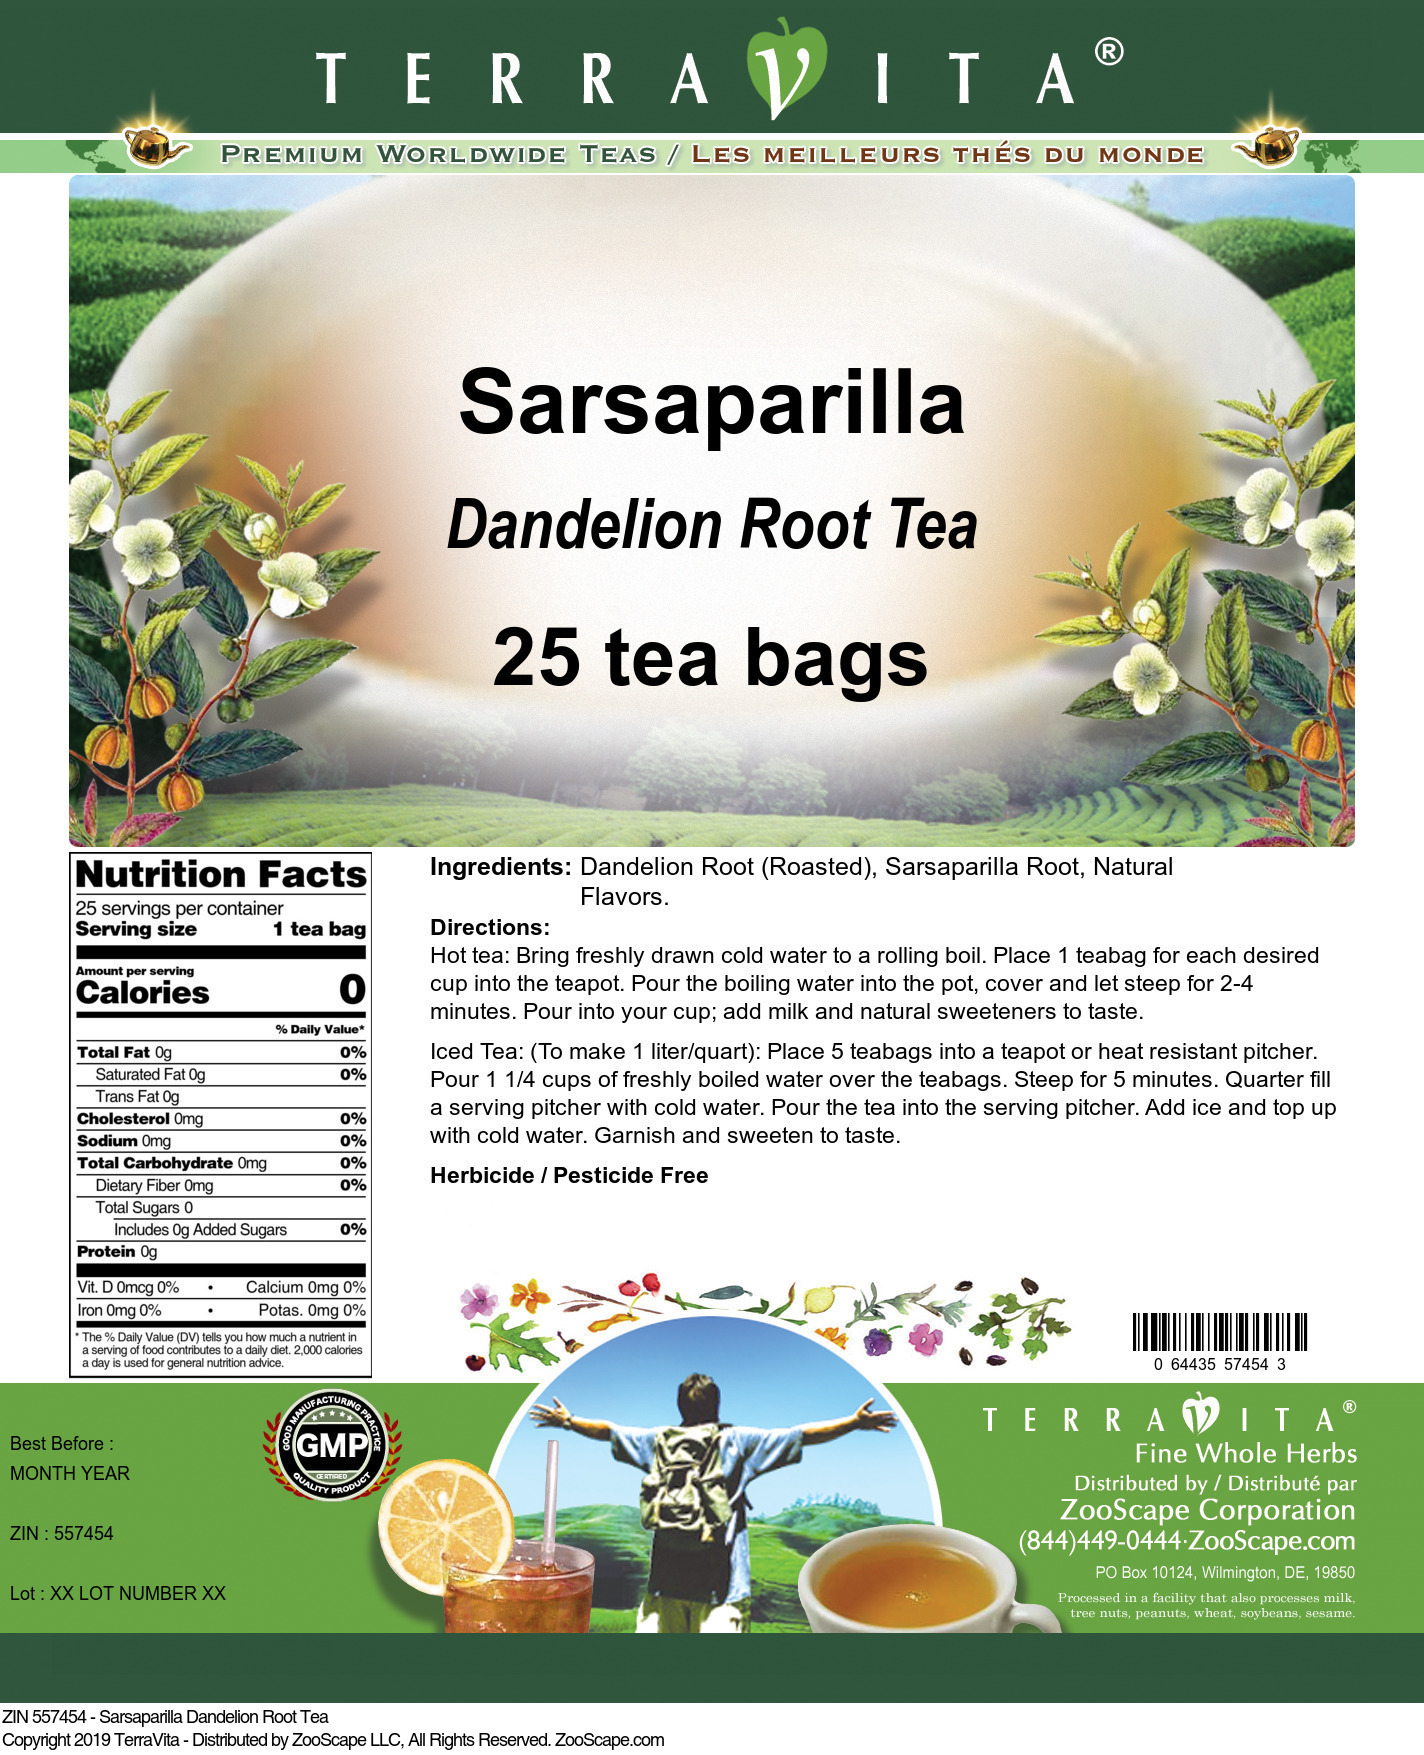 Sarsaparilla Dandelion Root Tea